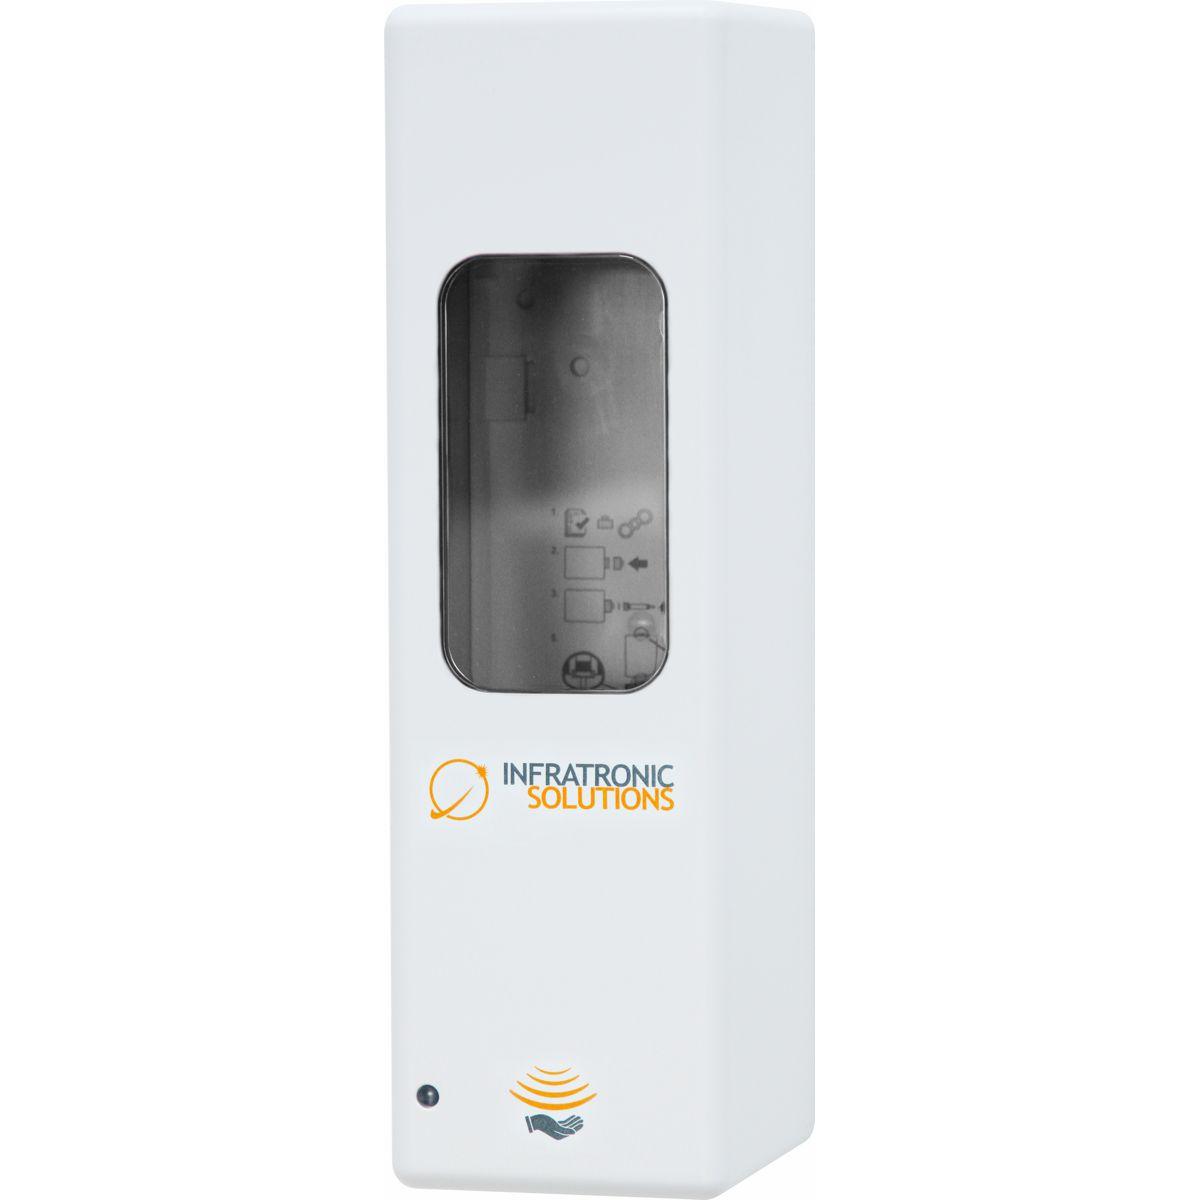 Sensorspender mit Zutrittskontrolle IT 1000 AW EURO 2